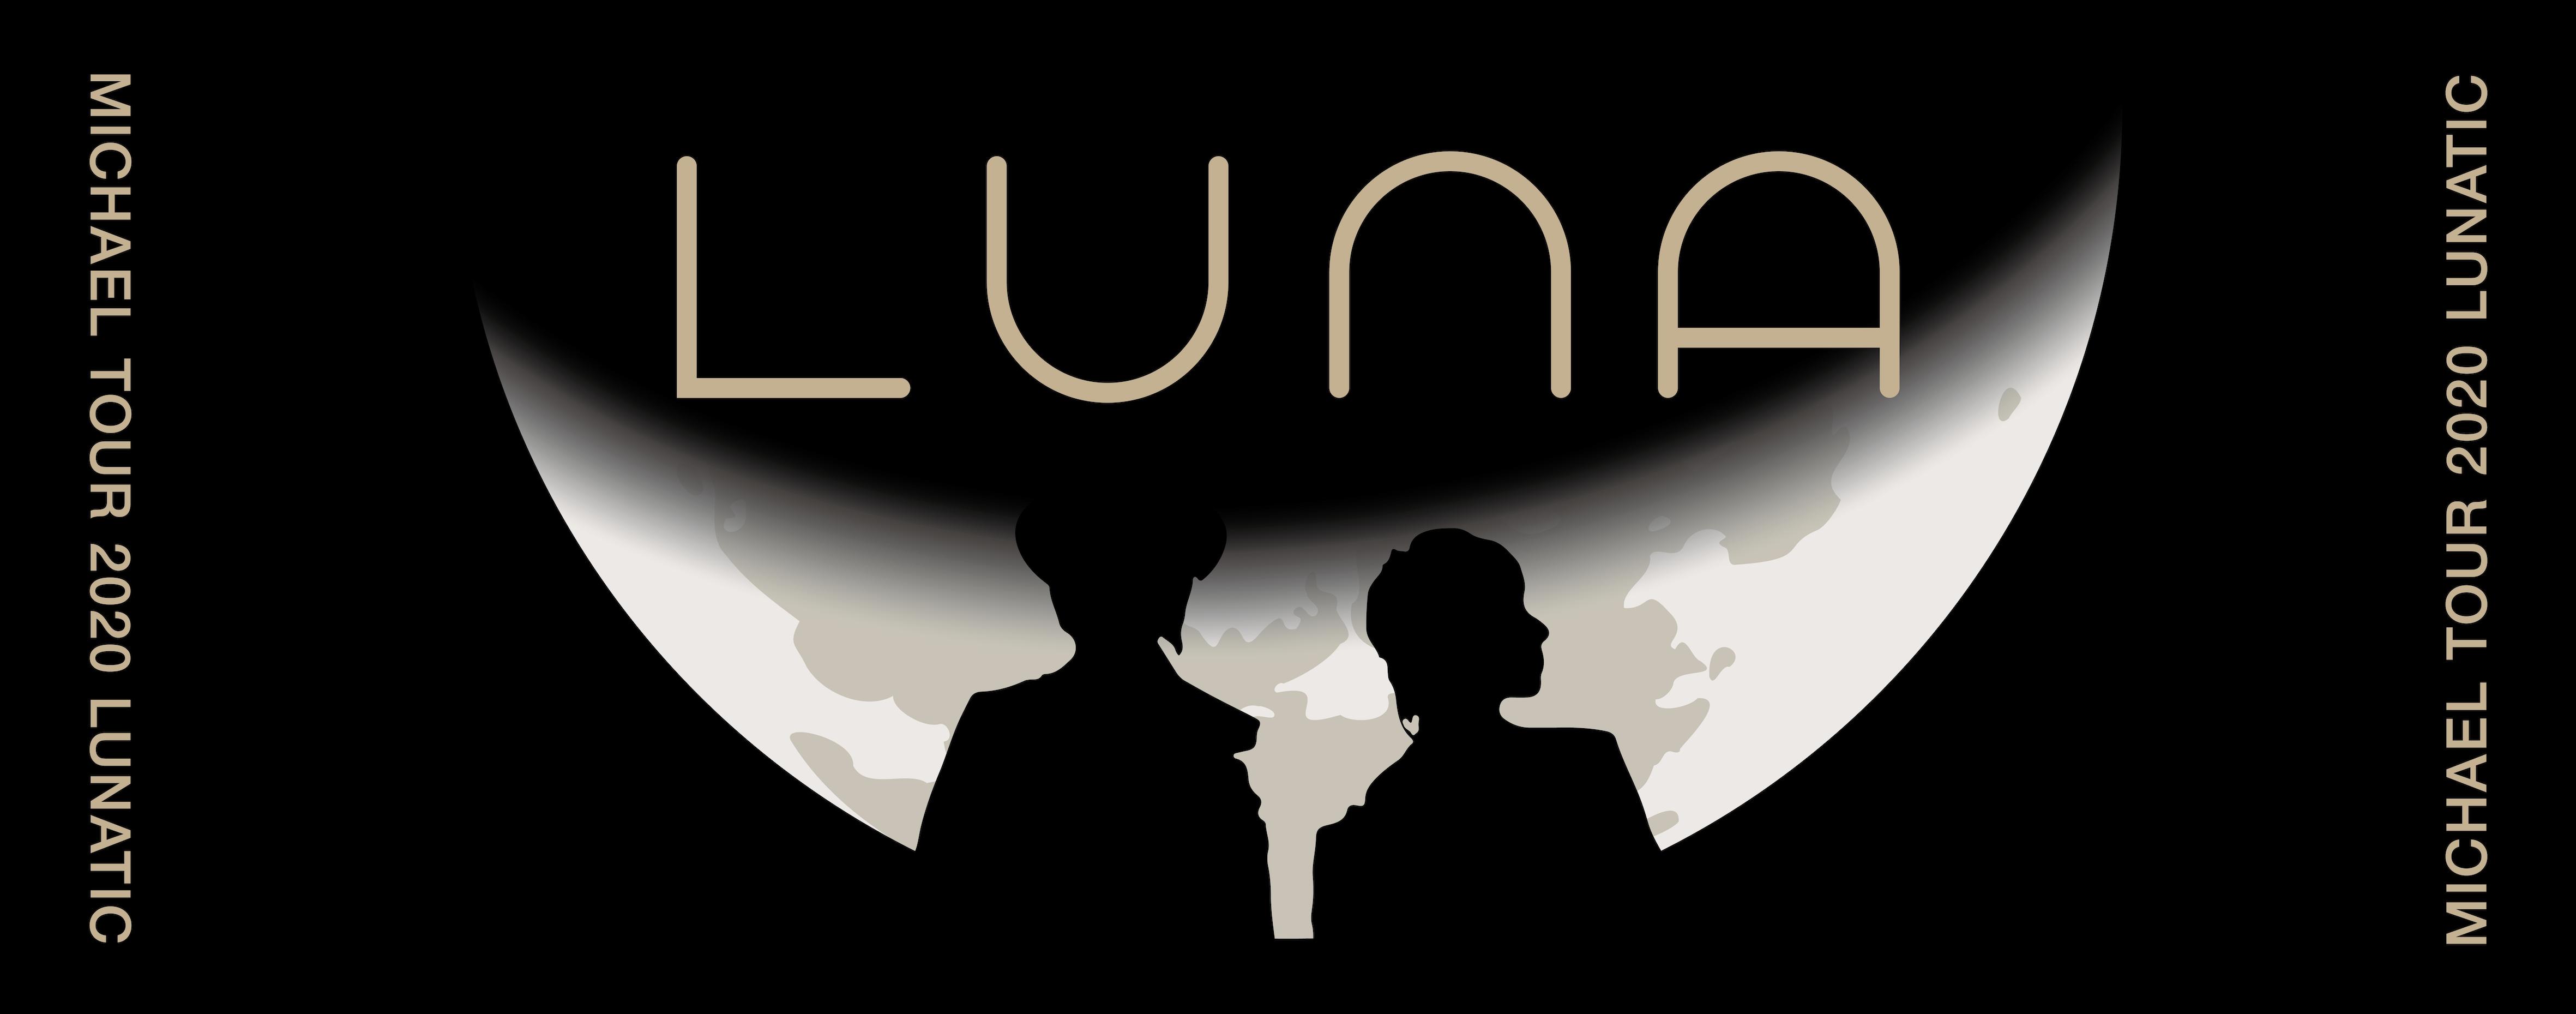 【MICHAEL TOUR 2020 Lunatic】フェイスタオル